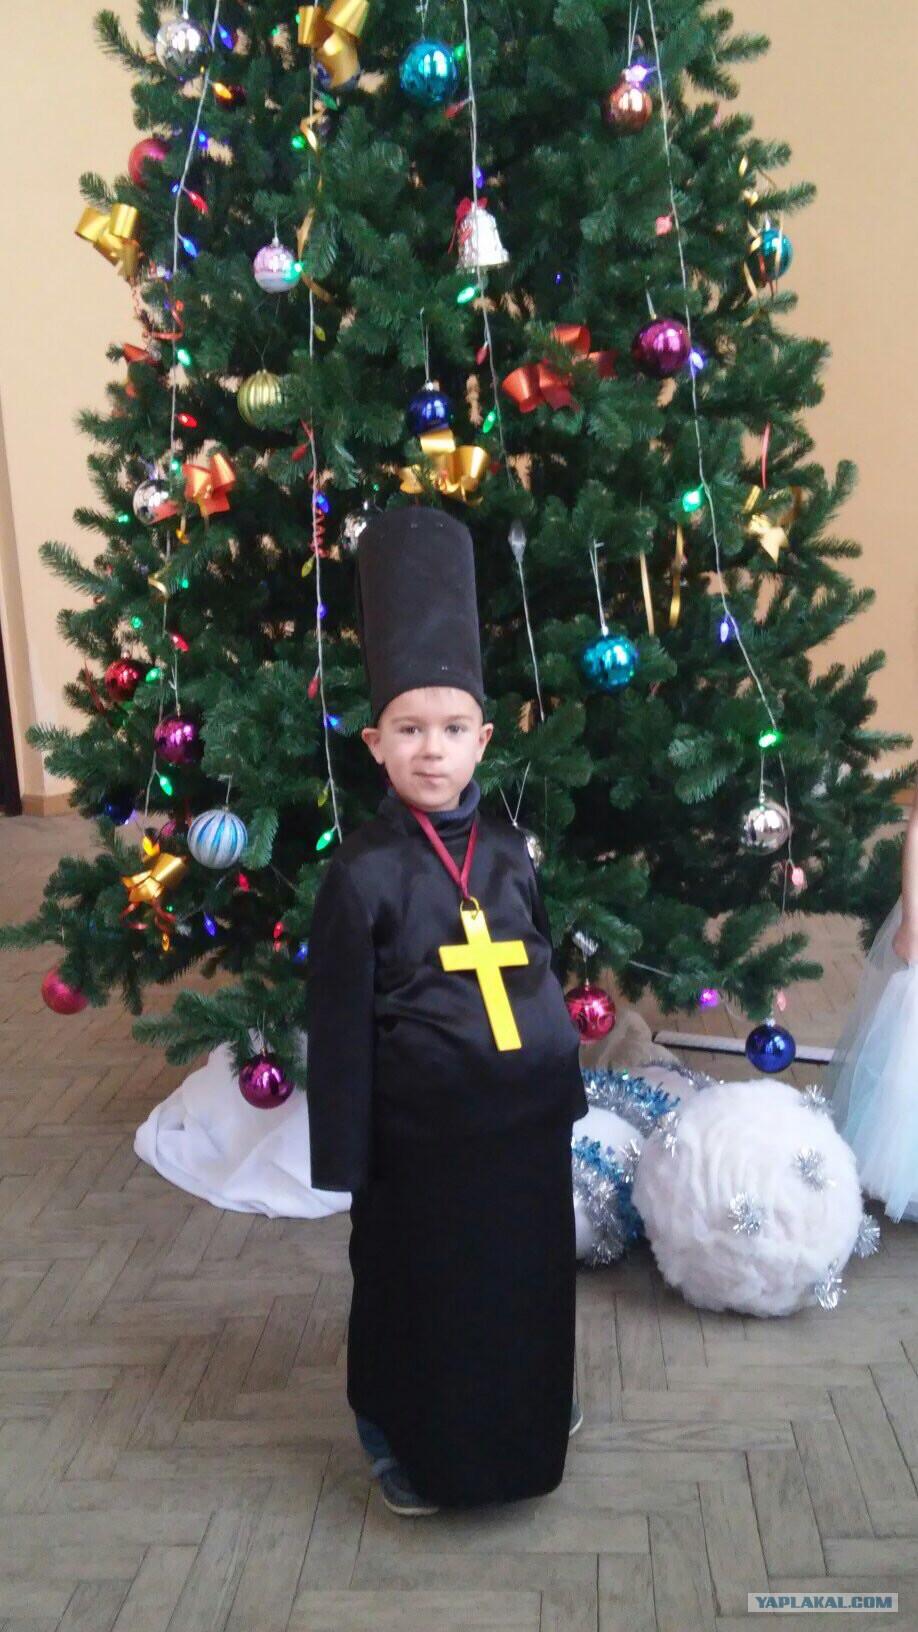 Лучший новогодний костюм для мальчика - ЯПлакалъ - photo#9